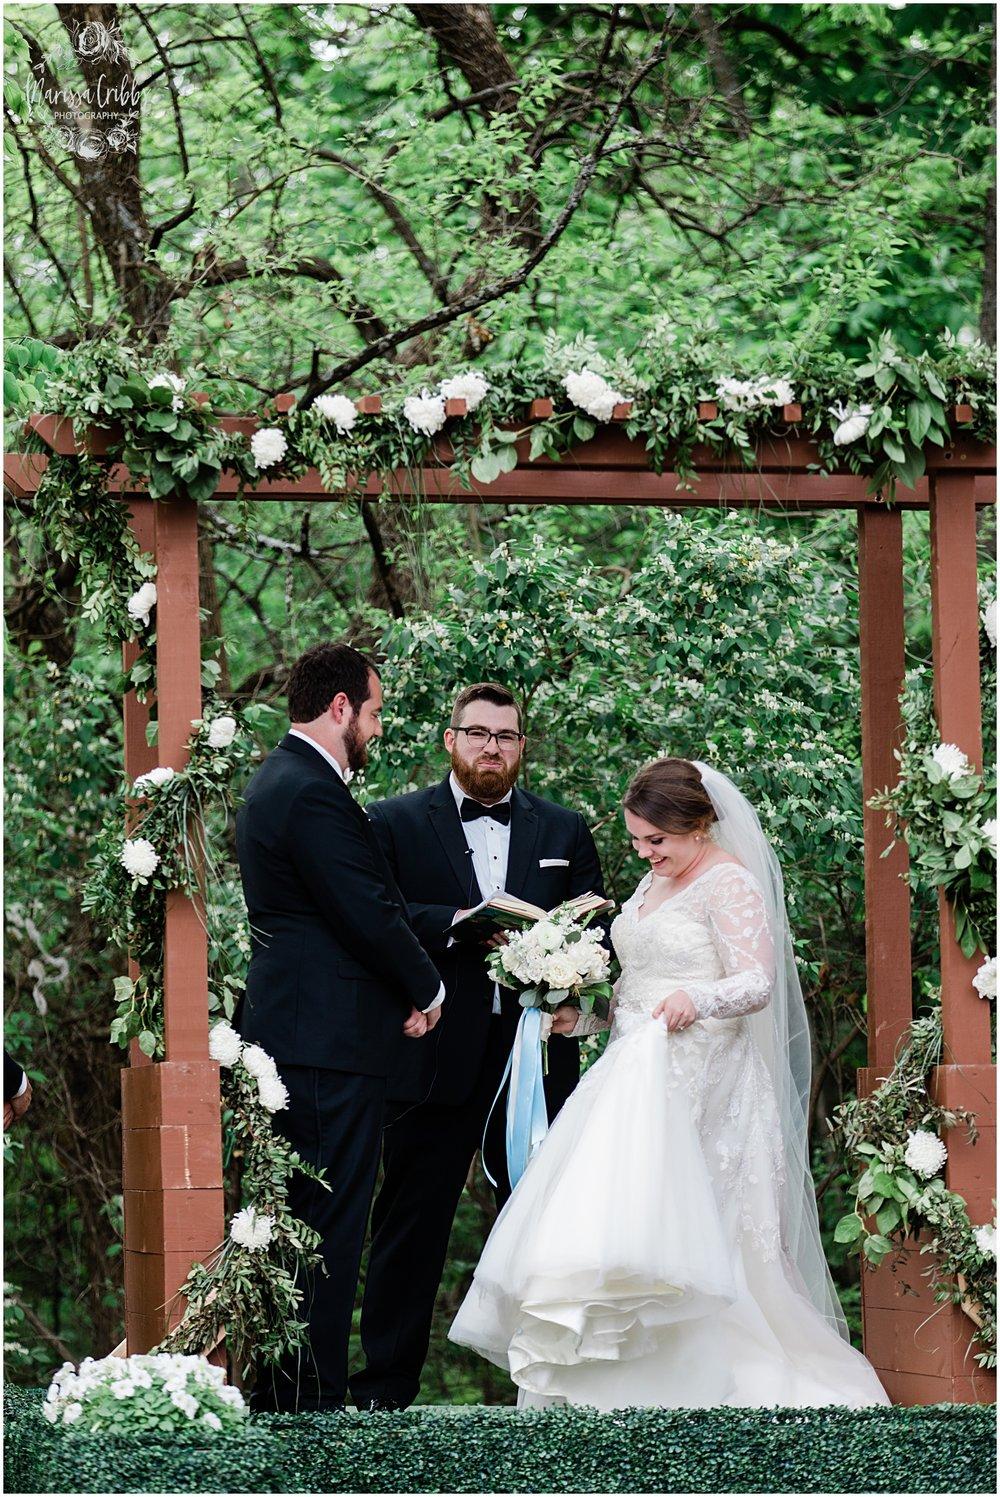 GORBY WEDDING | MARISSA CRIBBS PHOTOGRAPHY_5062.jpg